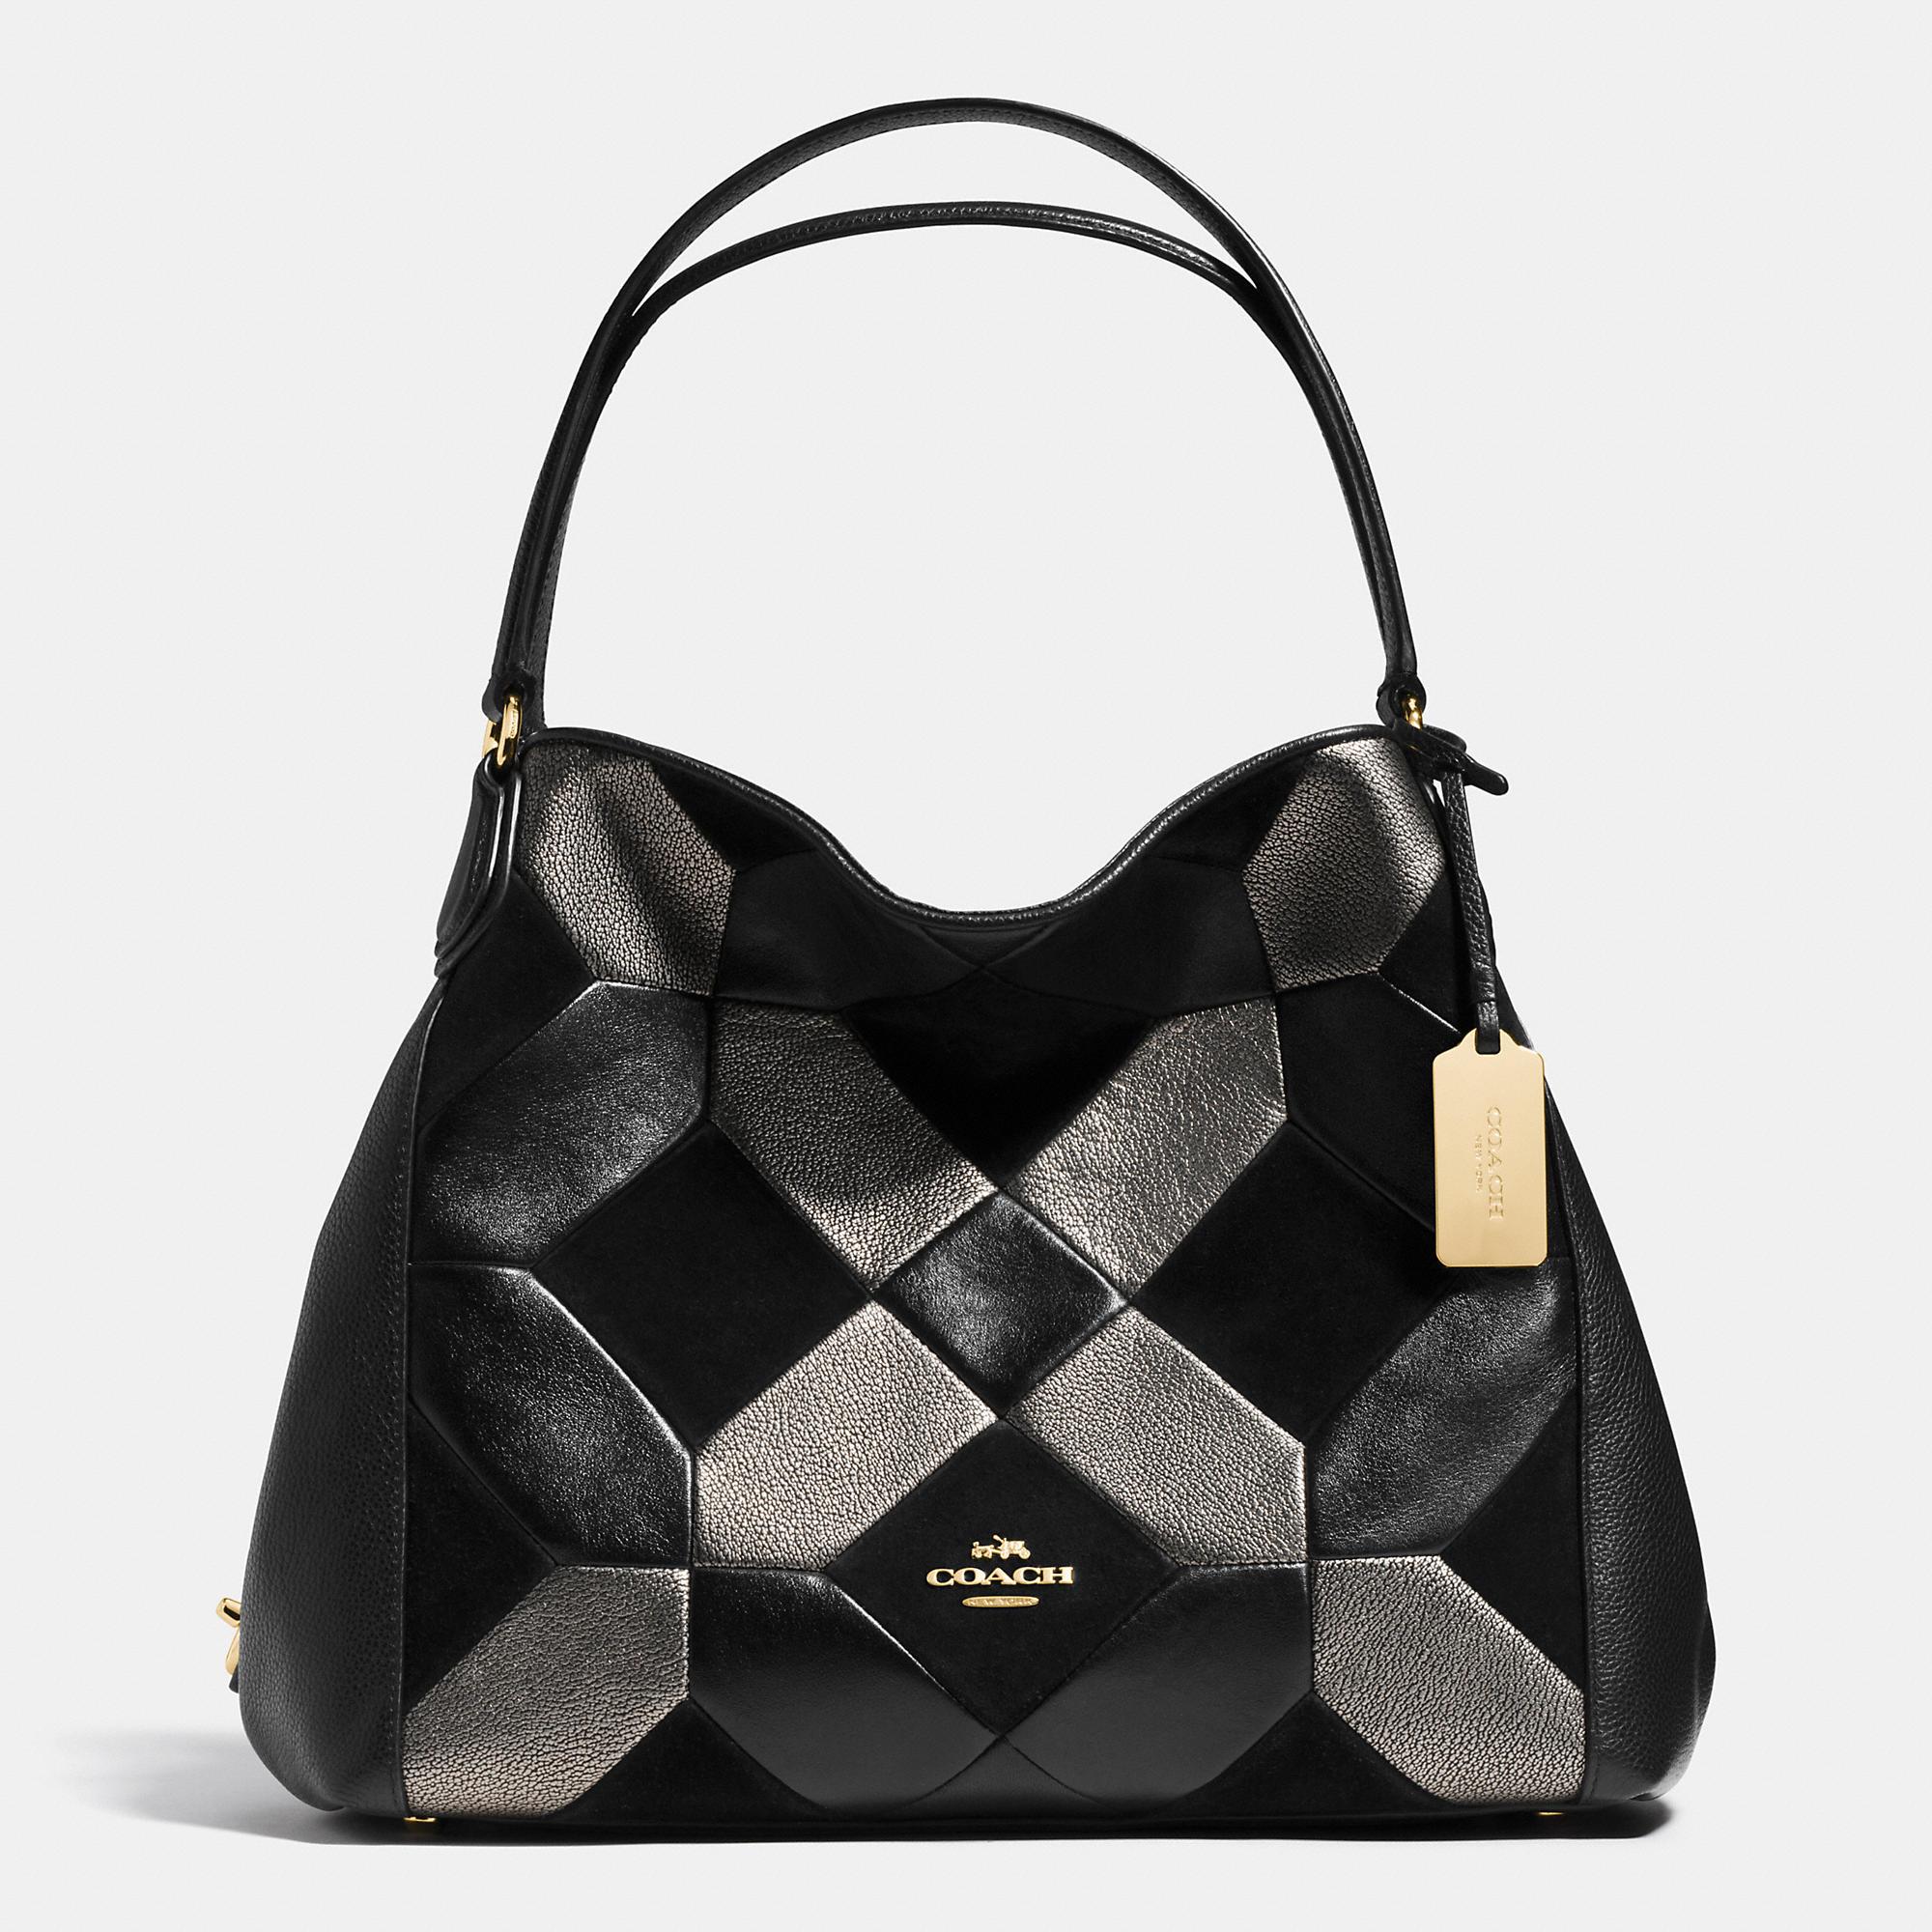 Coach Edie Shoulder Bag 31 In Patchwork Leather in Black | Lyst